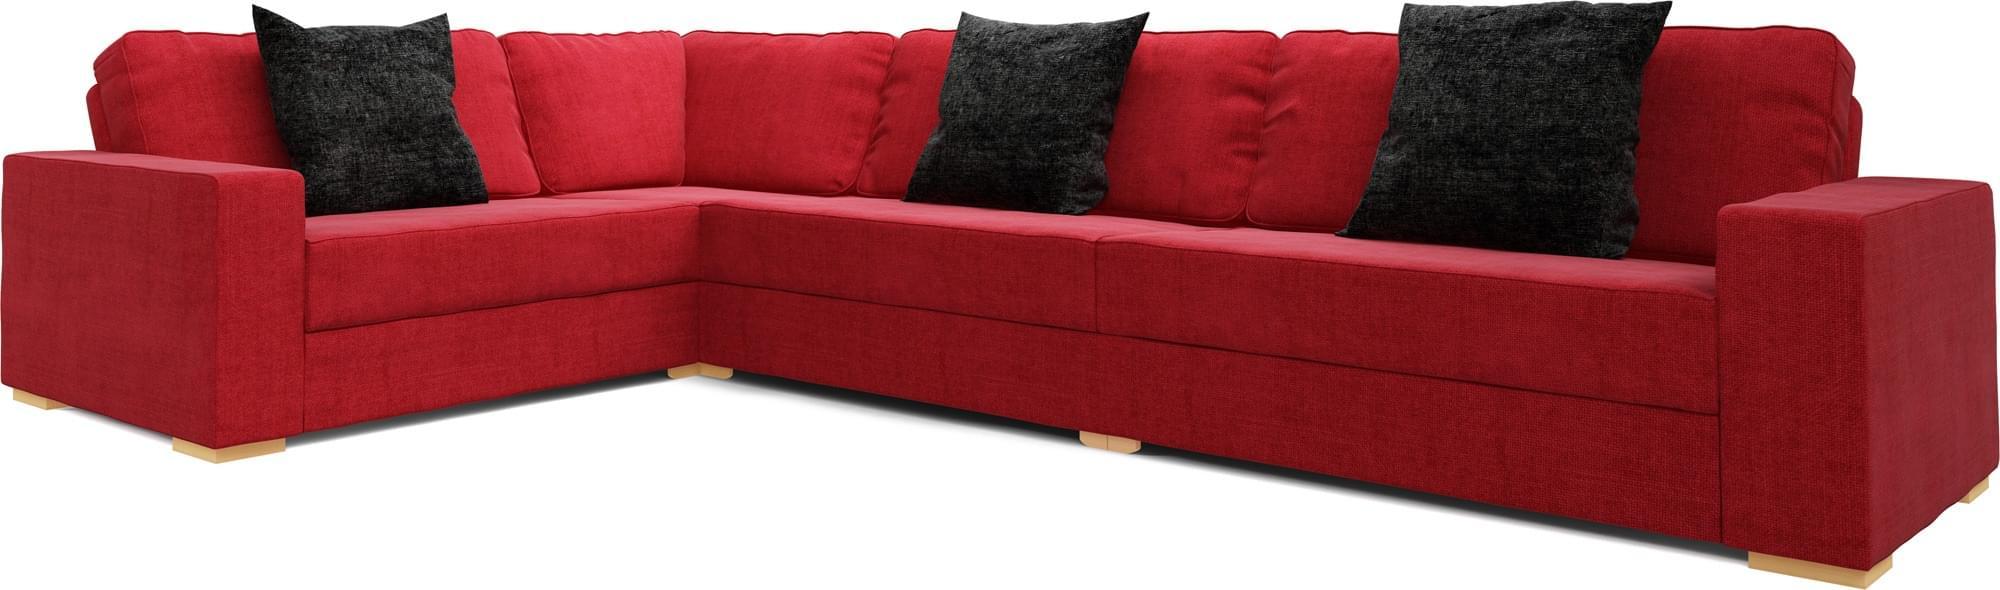 Xia 3x2 Sofa Bed Self Assembly Corner Sofa Bed Nabru